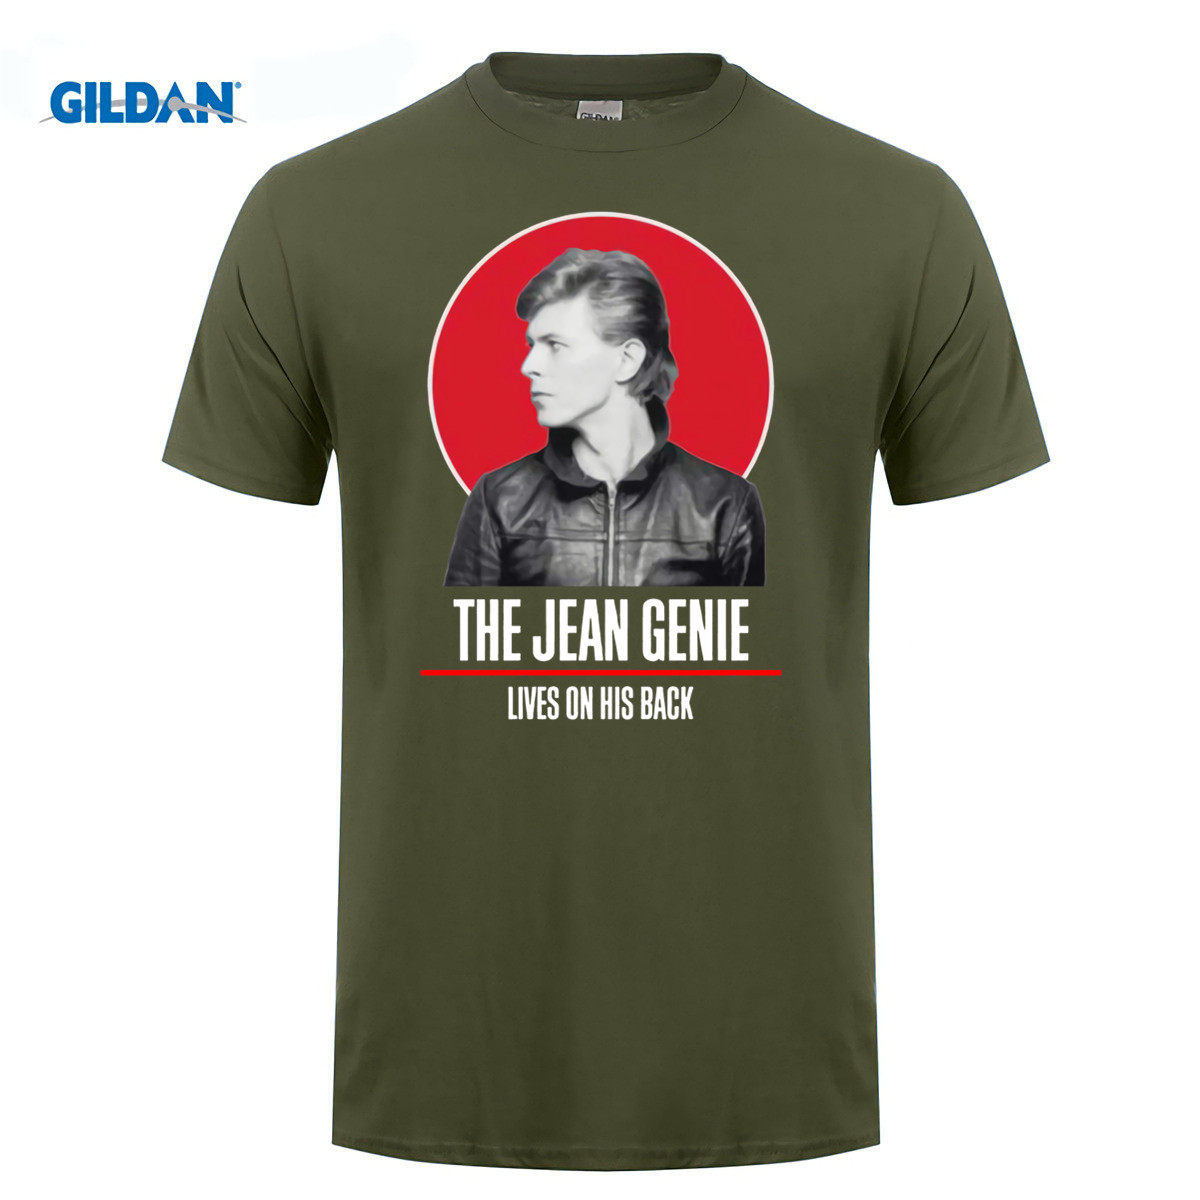 GILDAN 100% cotton O-neck printed T-shirt David Bowie T Shirt The Jean Genie